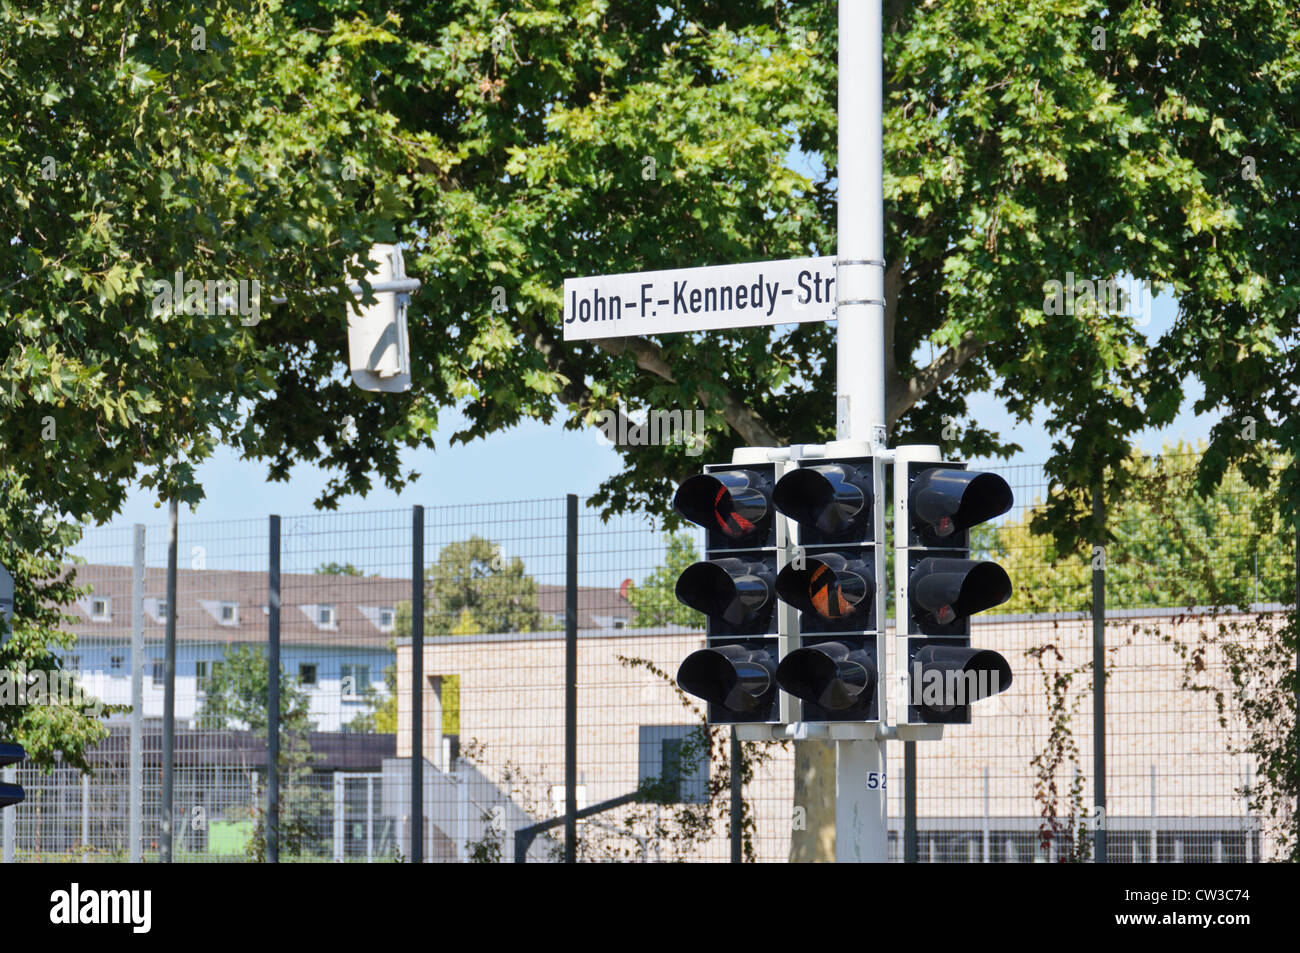 John-F.-Kennedy-Str street sign 2 traffic lights red and yellow - Heilbronn Germany Europe - Stock Image